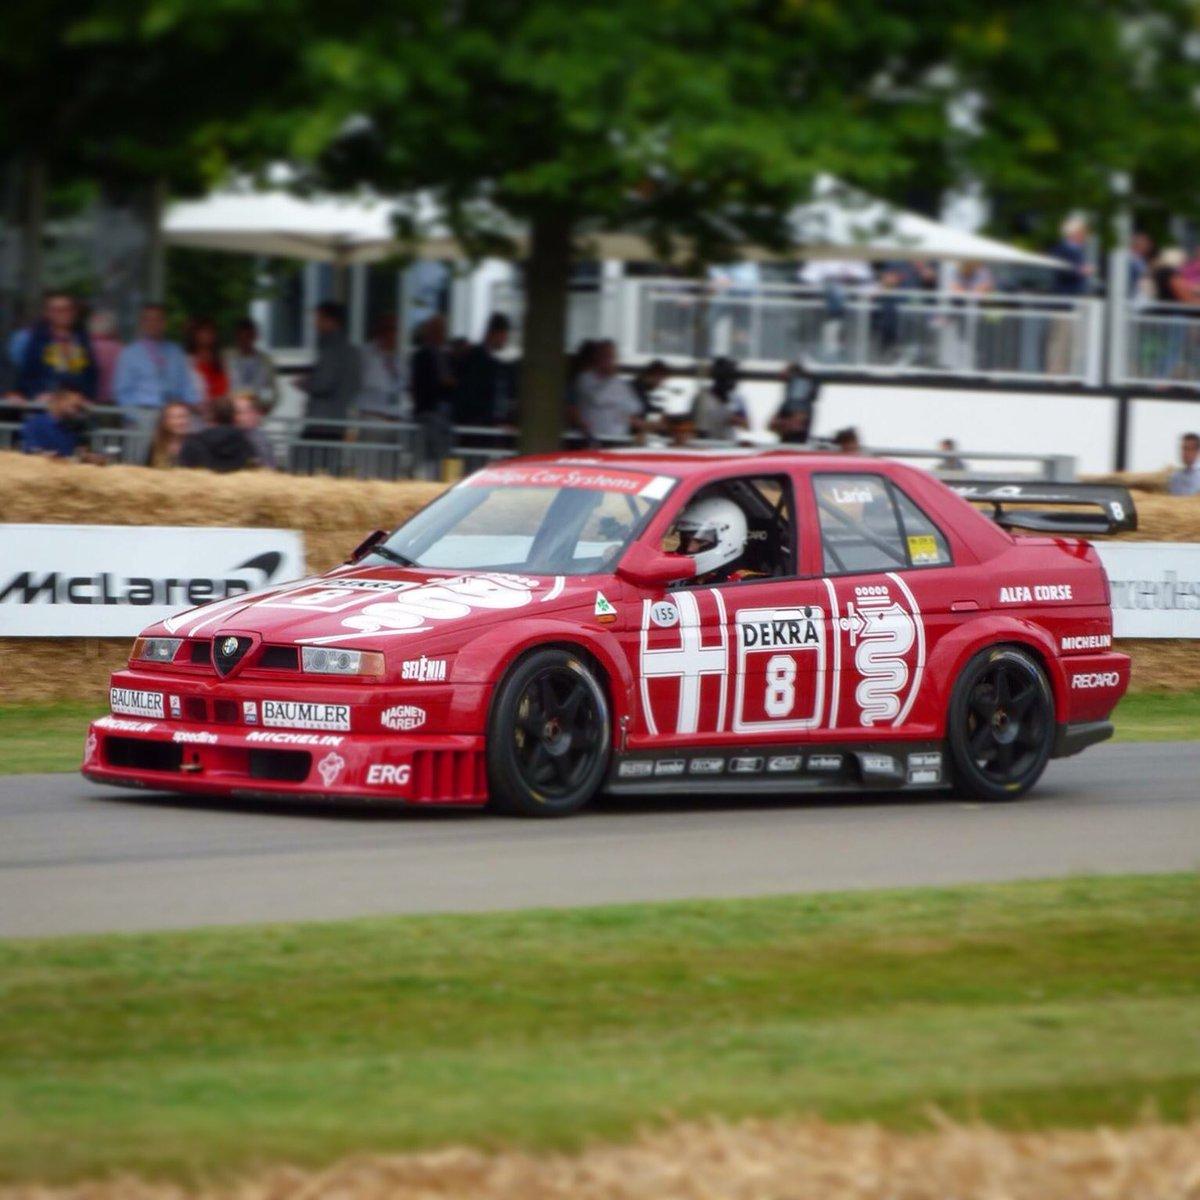 Batch On Twitter Best Car Of 2017 It Was One From 1993 Alfa Alfaromeo Dtm Alfa155 V6 Racing Racingcar Touring Cars Goodwood Fos Goodwoodfos